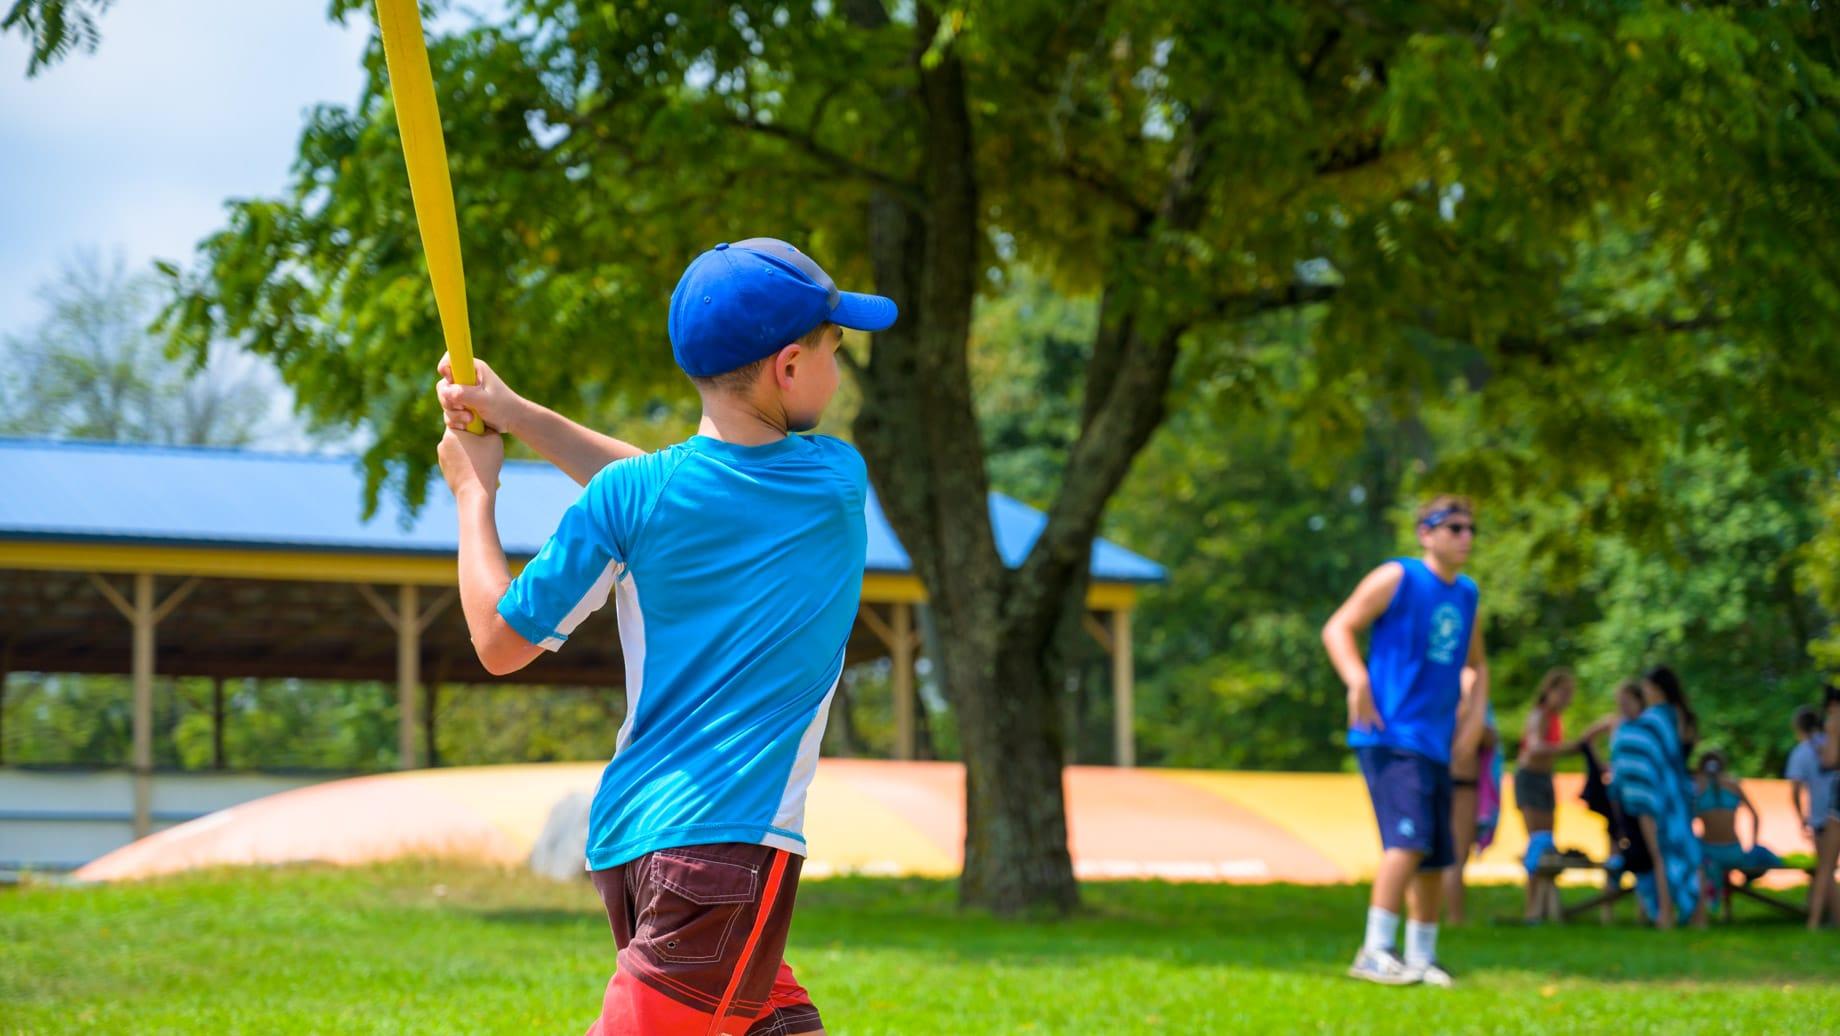 Camper hitting baseball bat